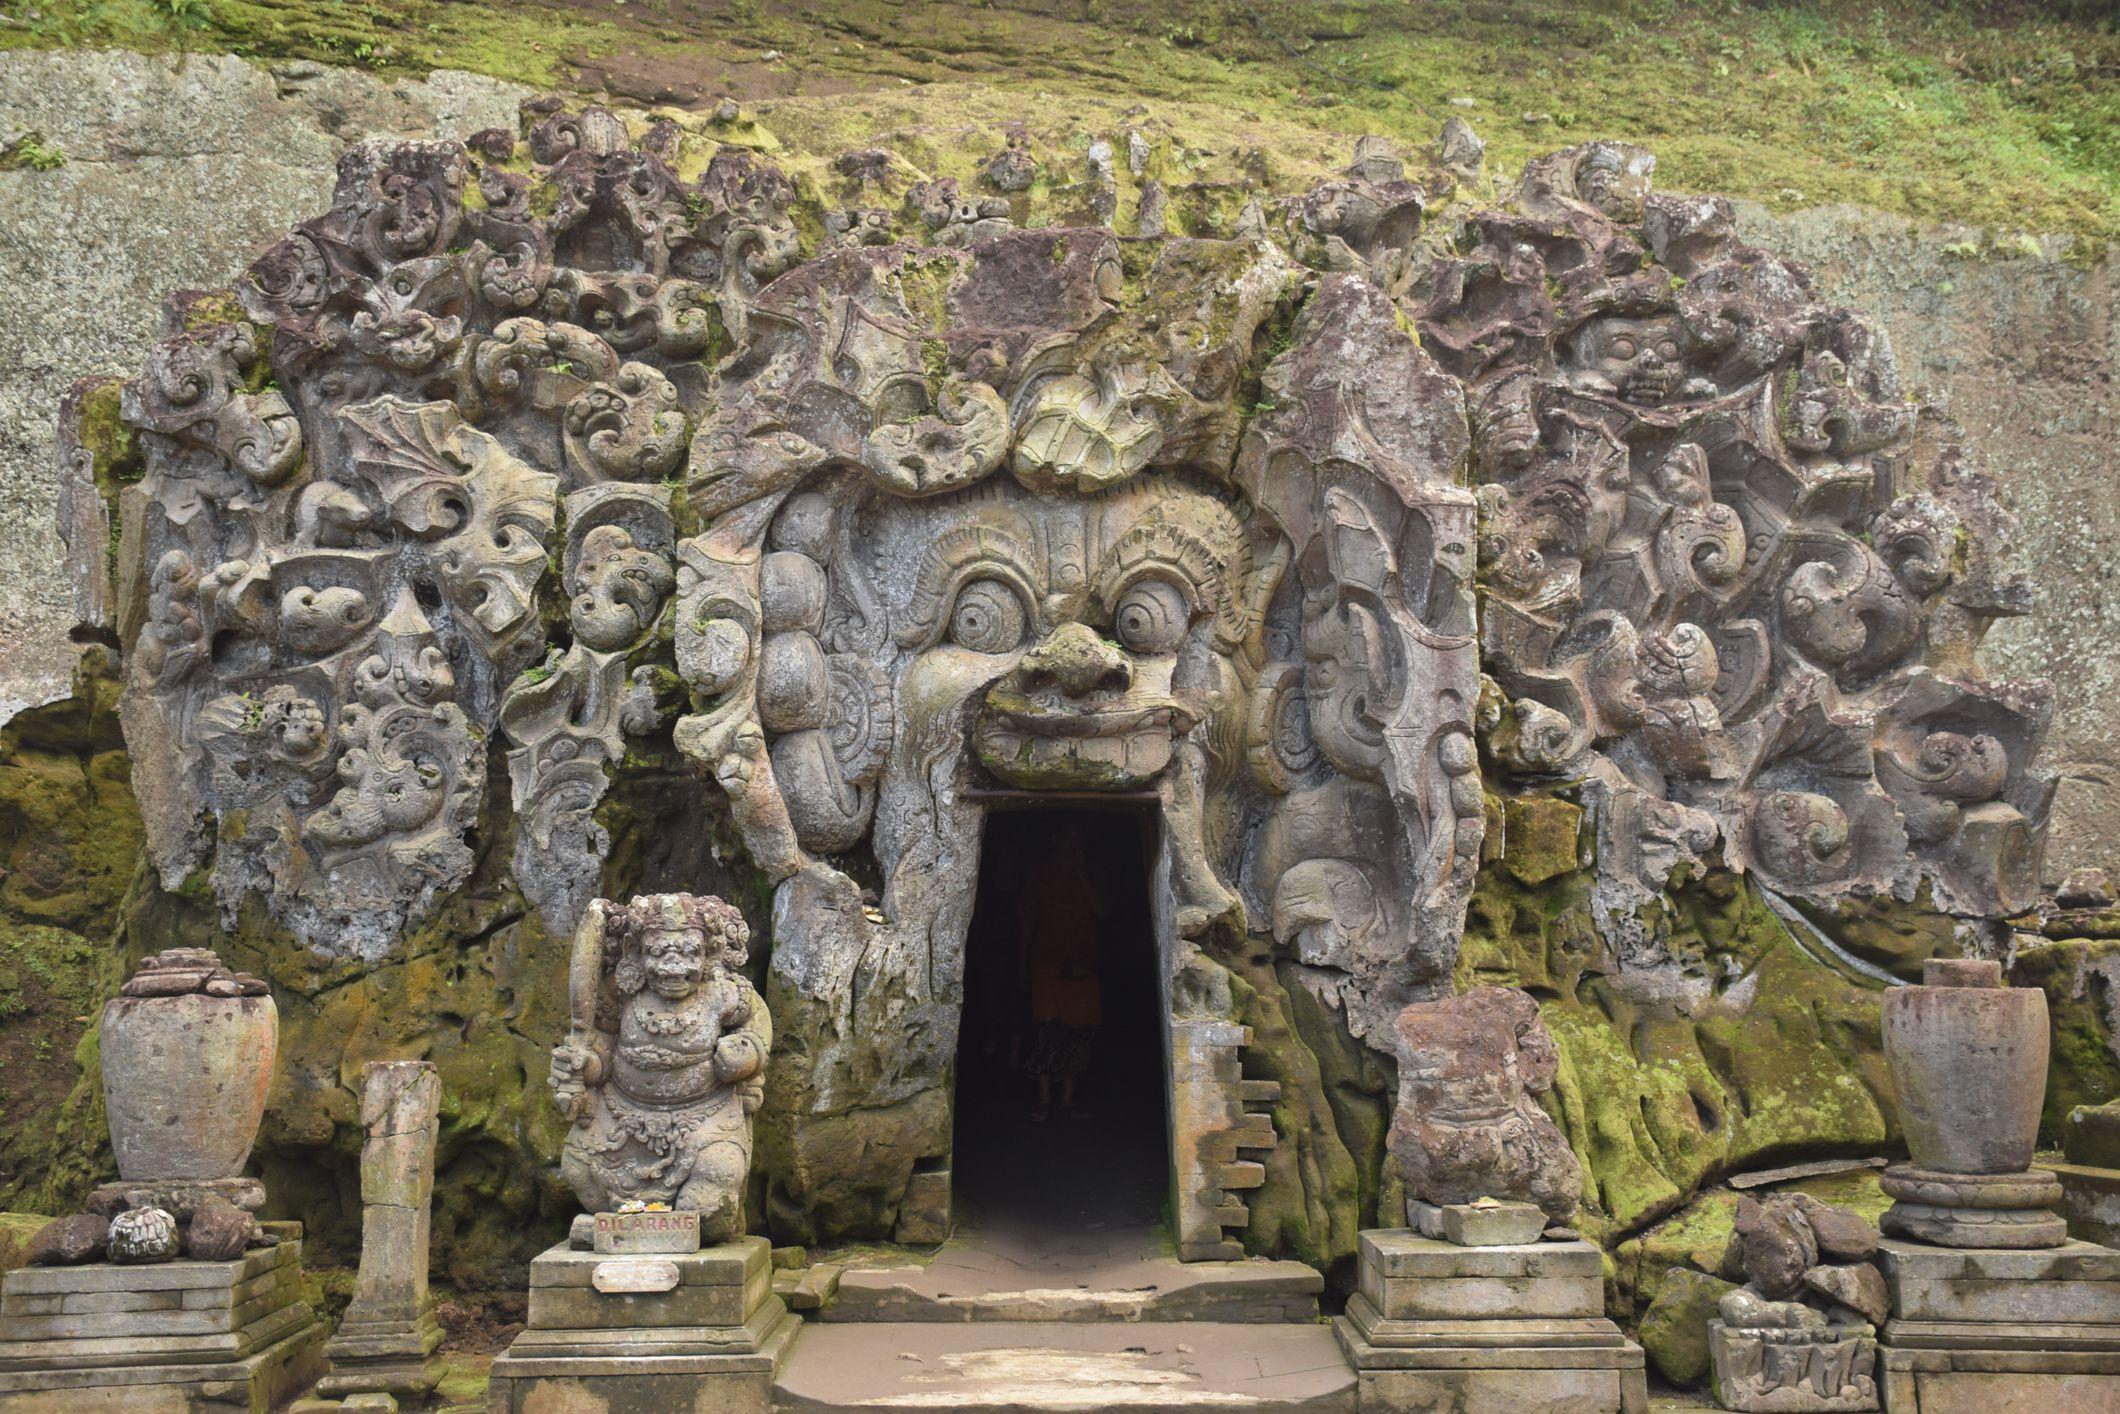 Goa Gajah Near Ubud Bali The Eerie Elephant Cave